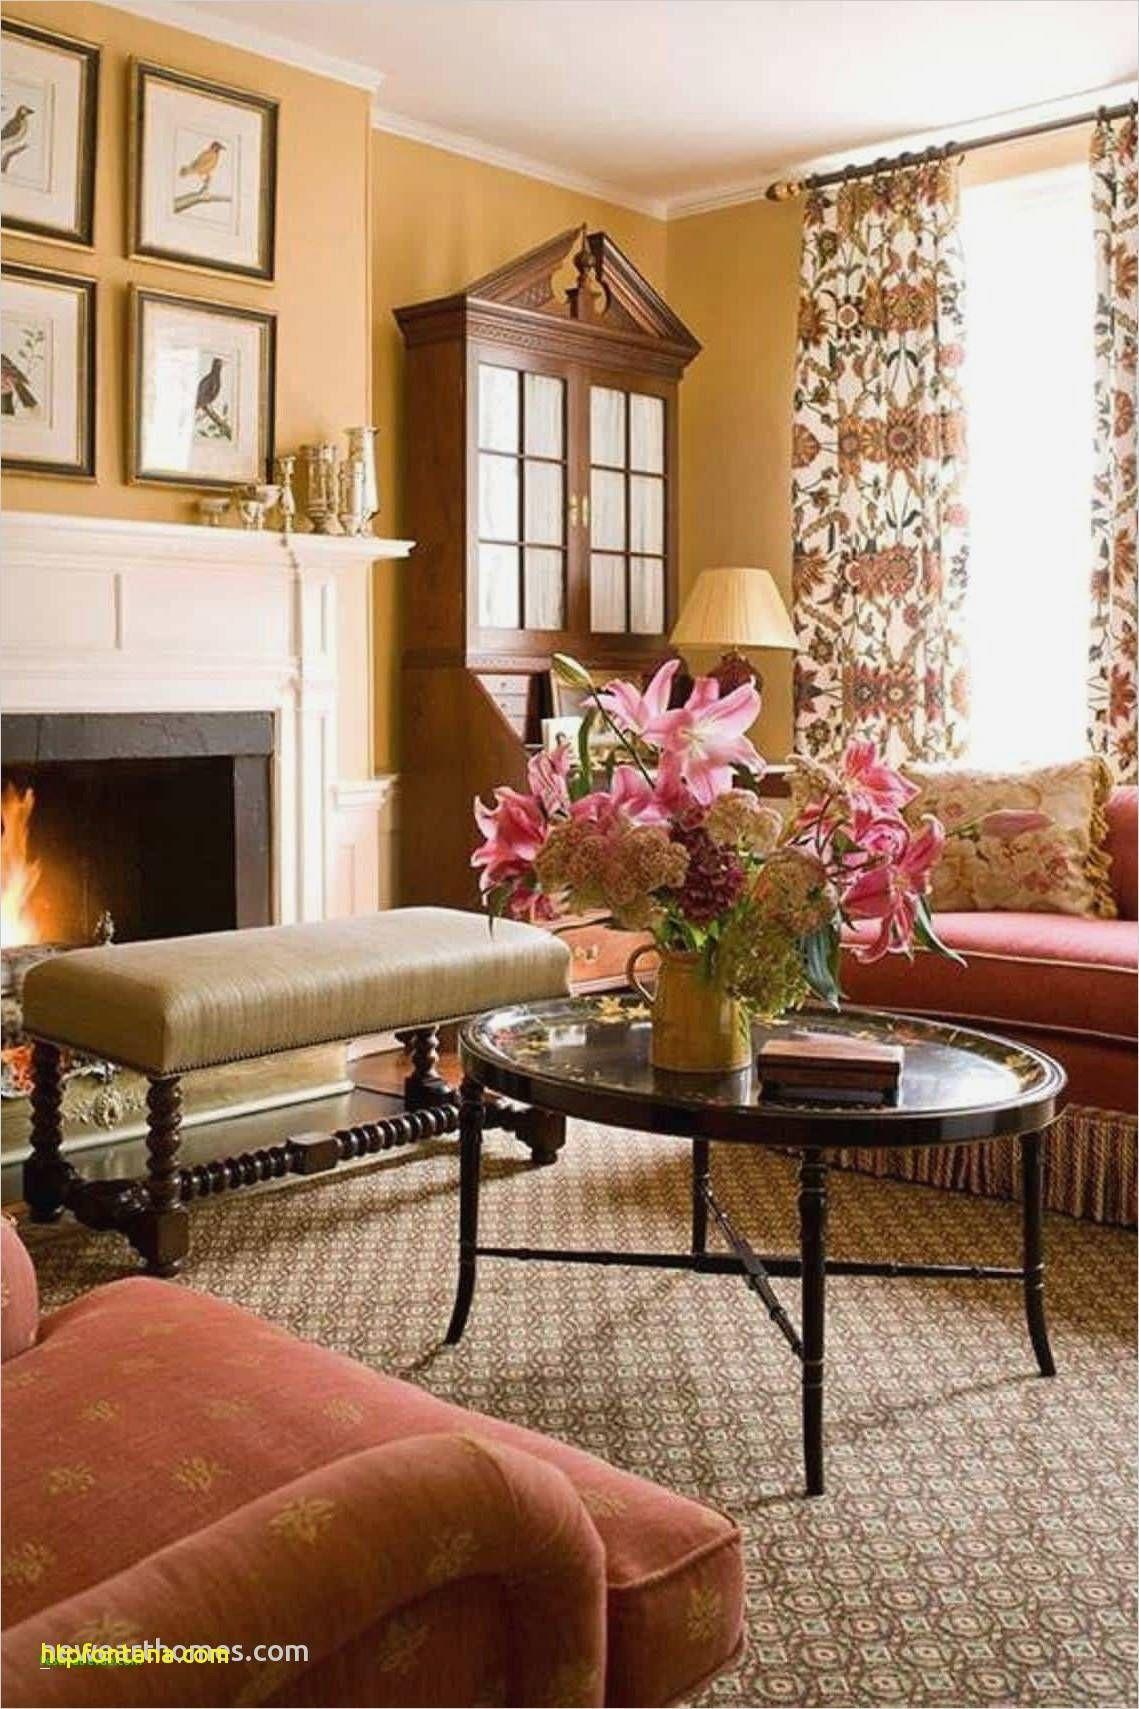 9 Living Room No Coffee Table Images Interior Desain Interior